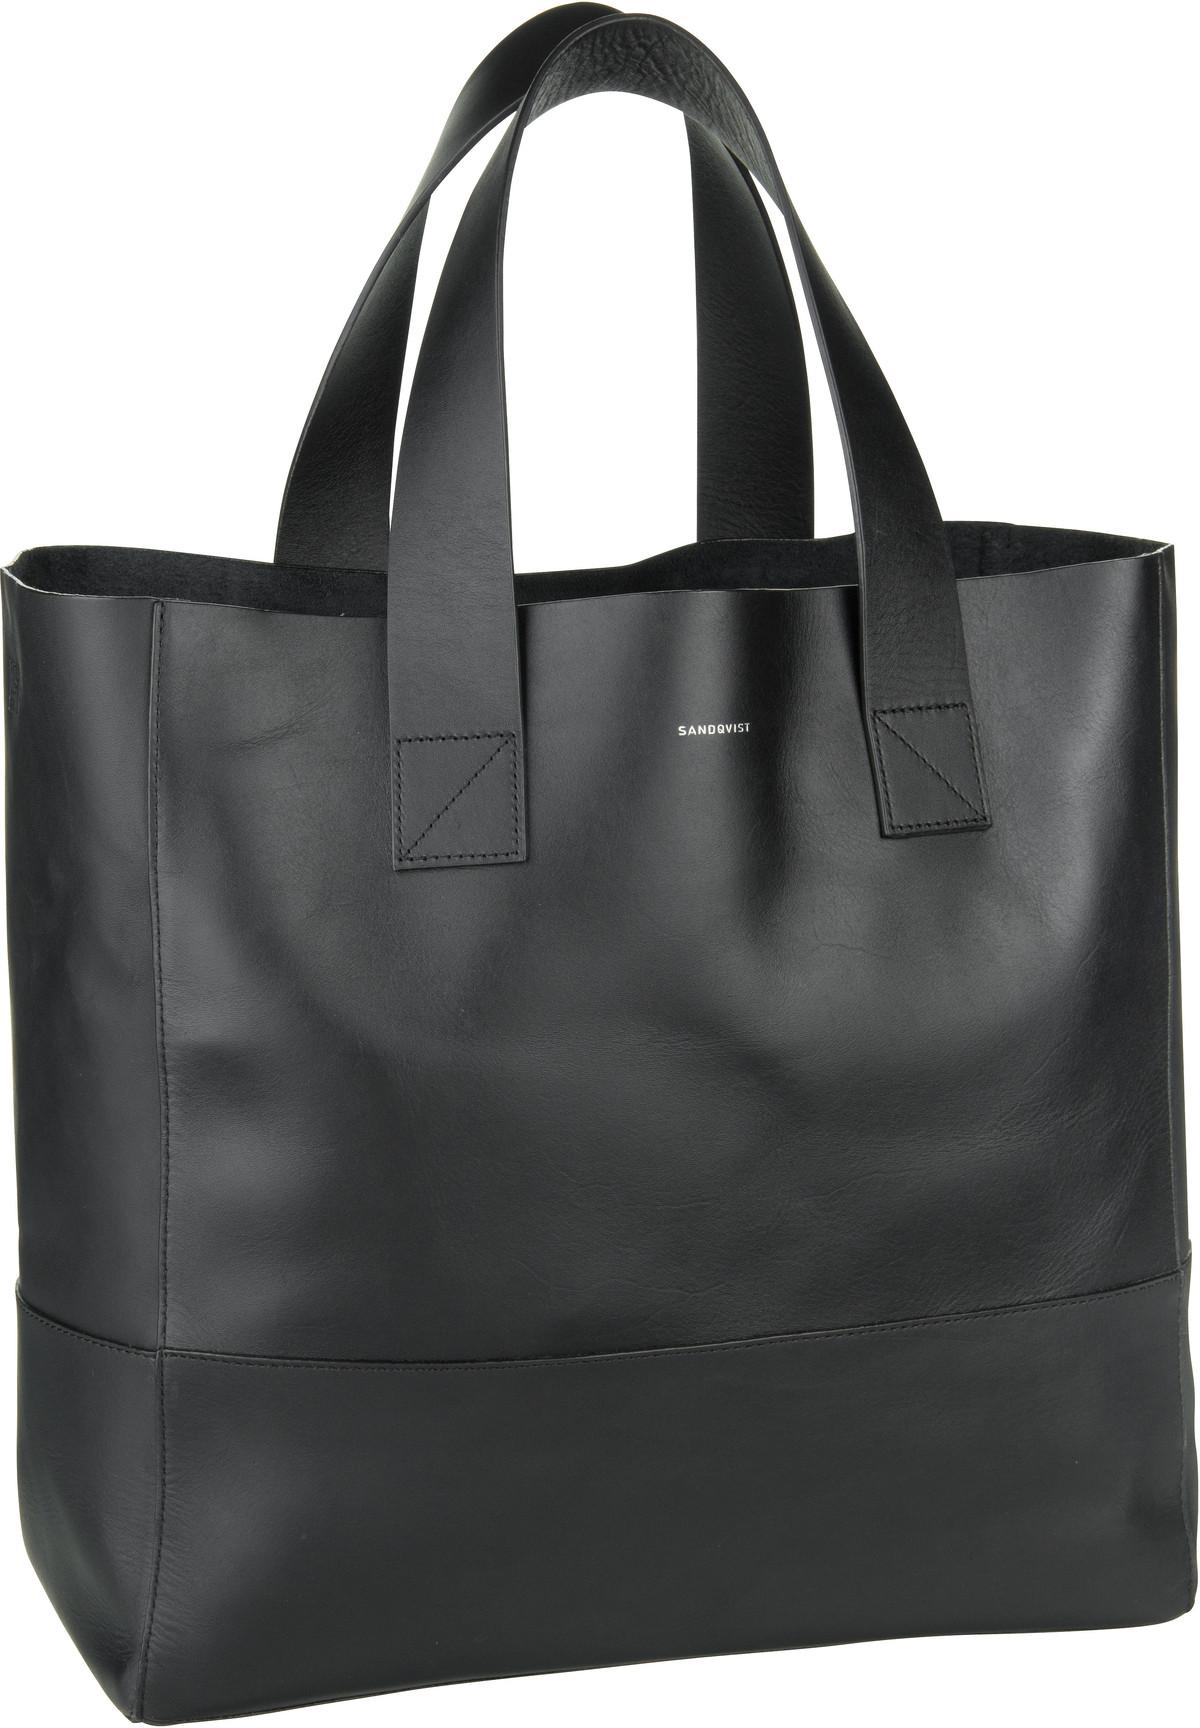 Handtasche Iris Tote Bag Black (19 Liter)